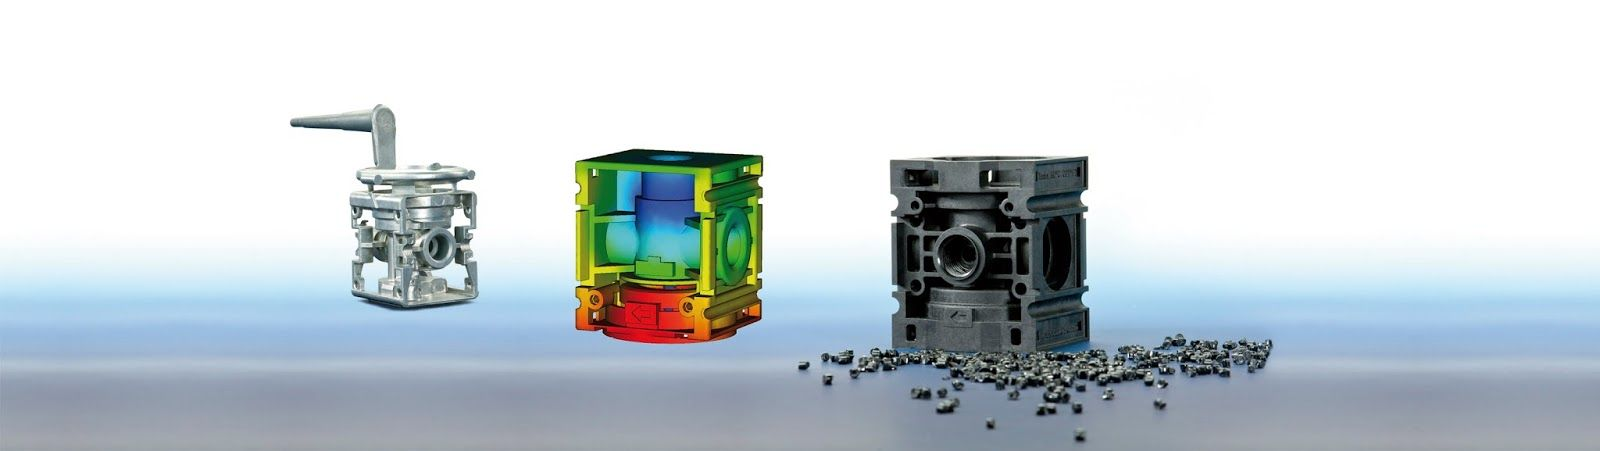 EN - Replacing metal structures with fiber-reinforced thermoplastics-tausta